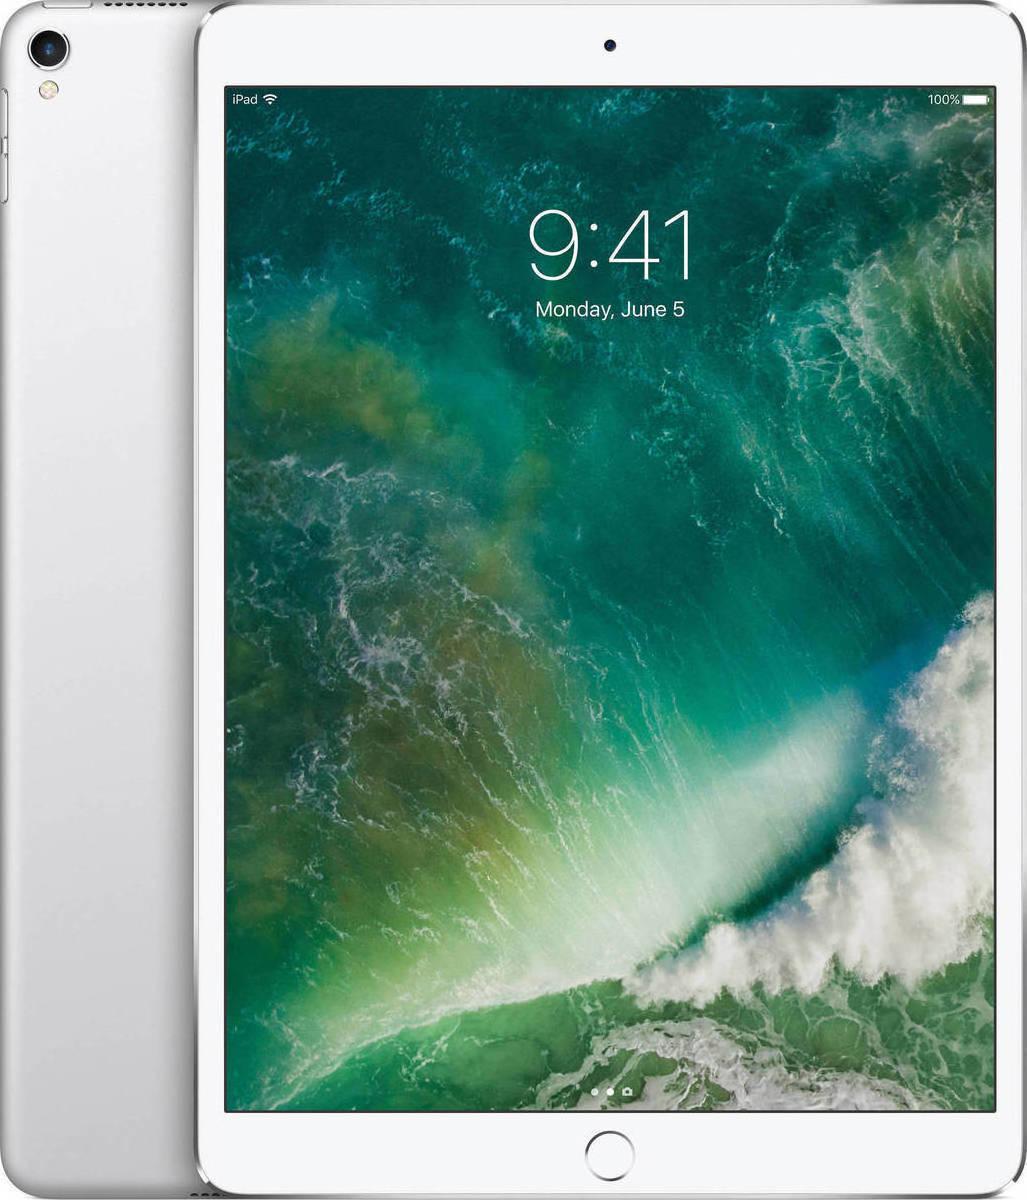 Apple iPad Pro 10.5'' 2017 WiFi and Cellular 64GB Silver Με Αντάπτορα Πληρωμή έως 12 δόσεις